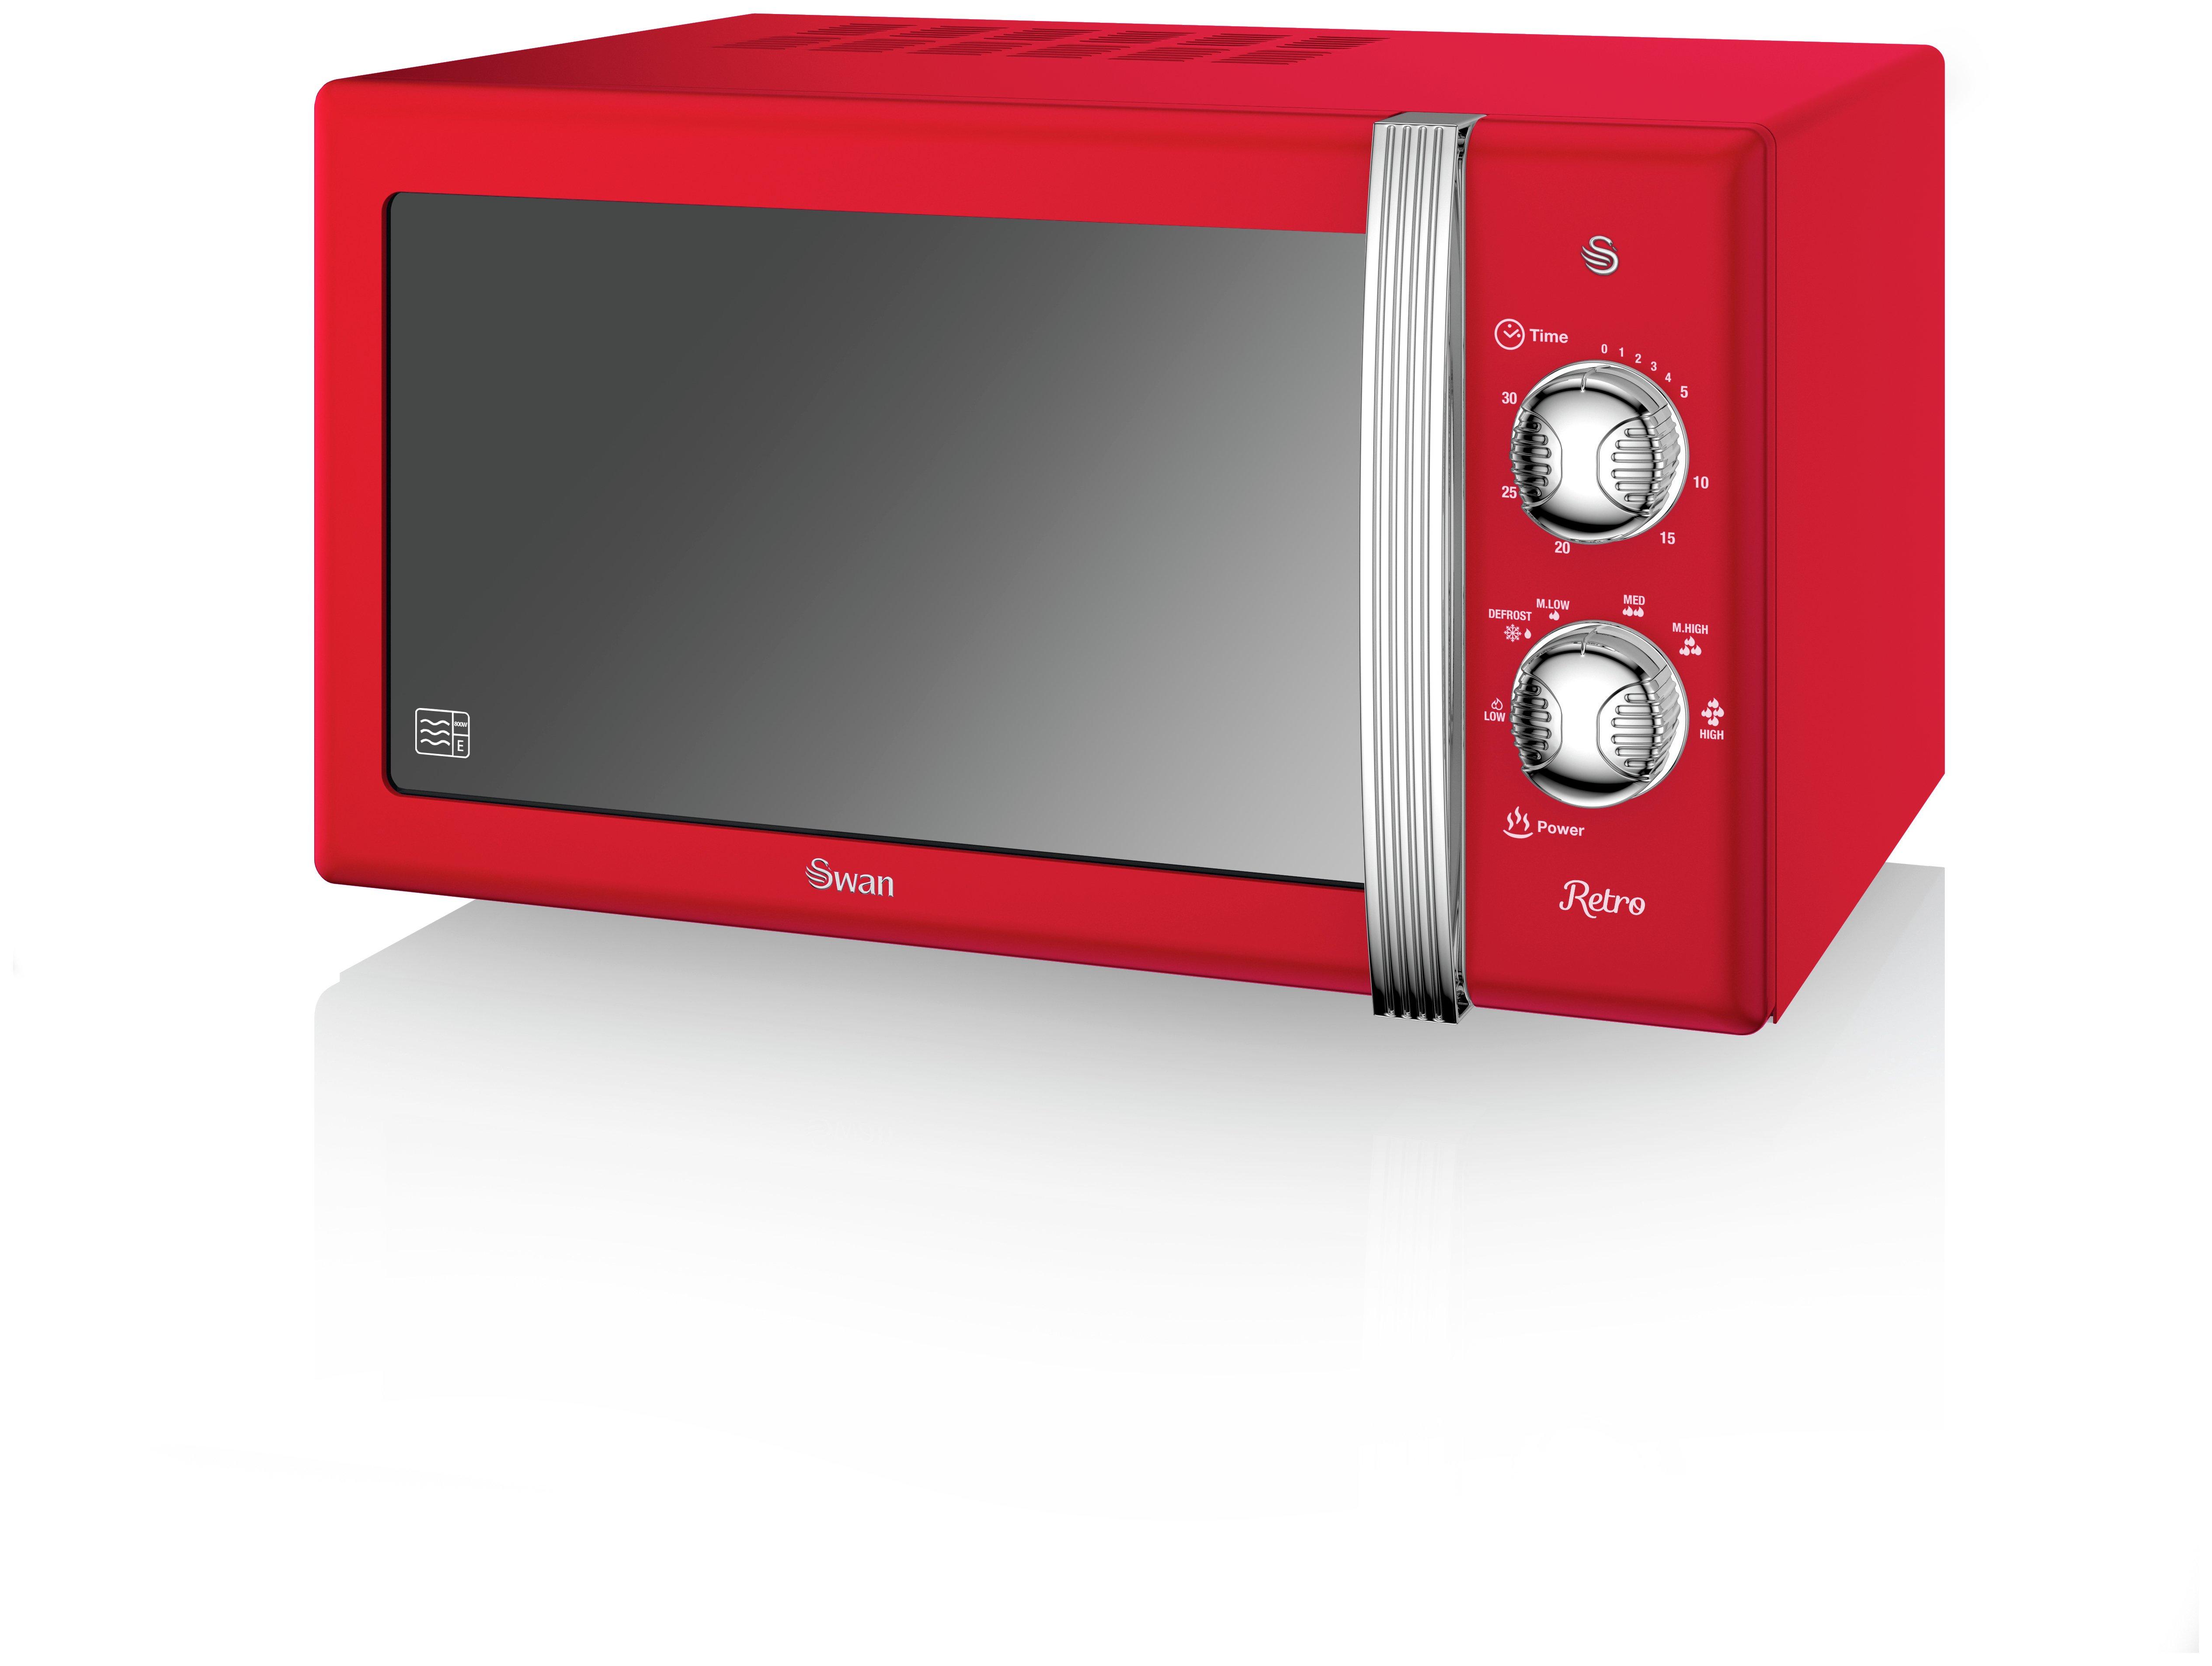 sharp 900w standard microwave r372km black. swan 800w standard microwave sm22130rn - red sharp 900w r372km black